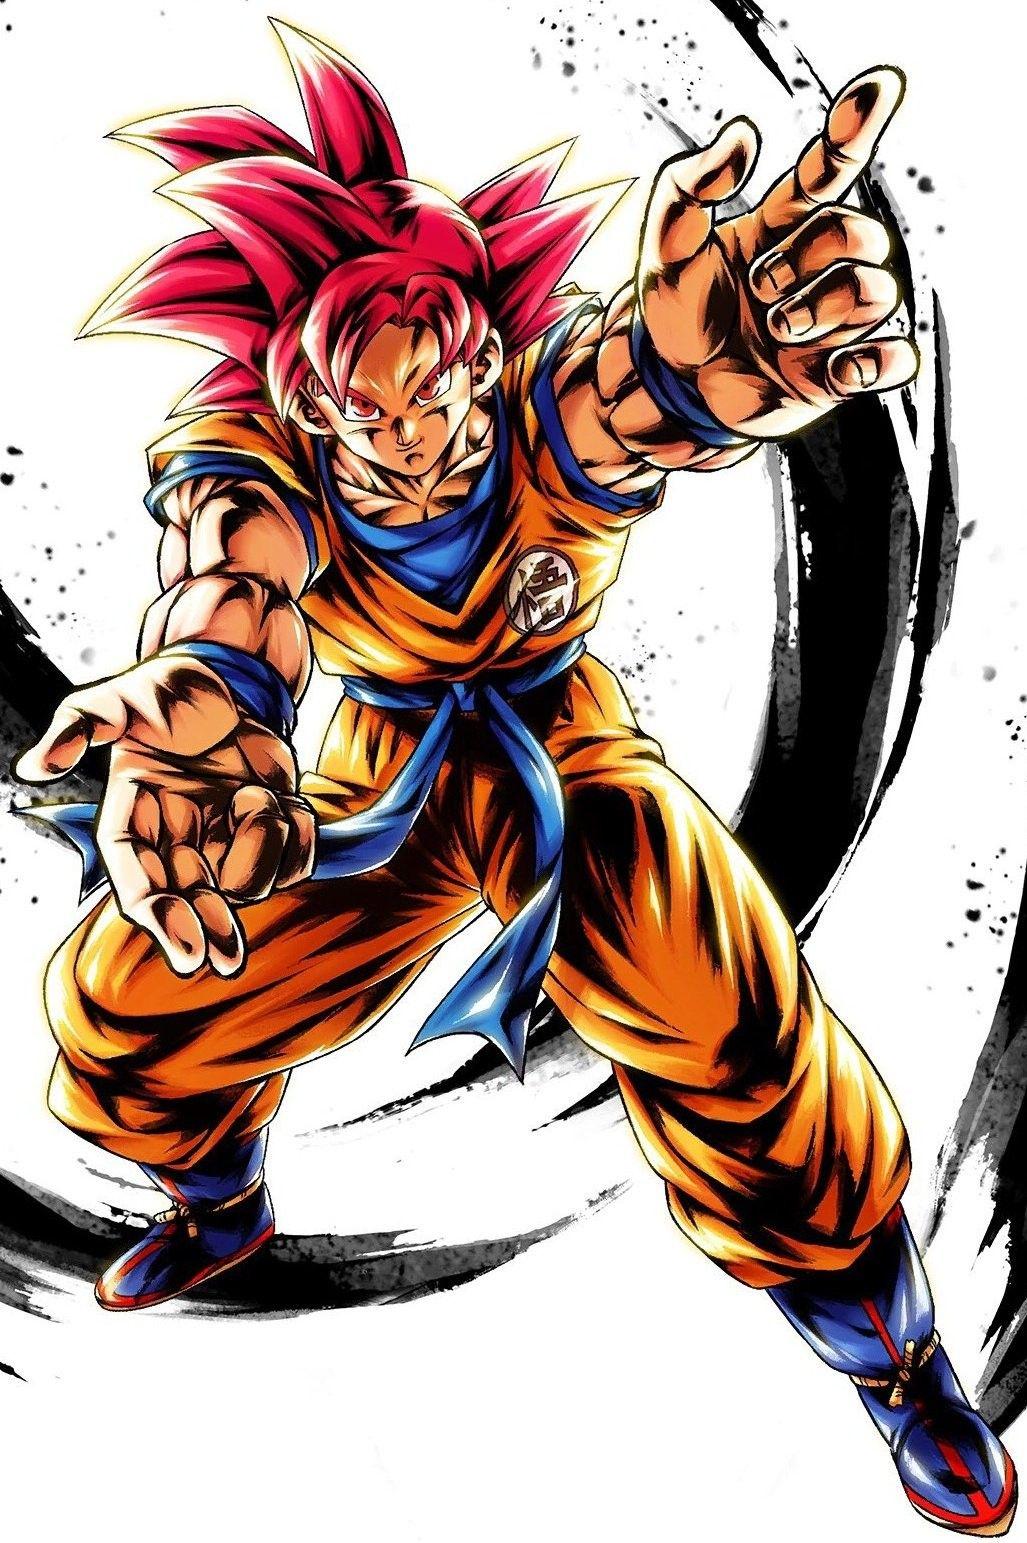 Goku Super Saiyan God Dragon Ball Legends Dragon Ball Super Manga Dragon Ball Super Artwork Dragon Ball Super